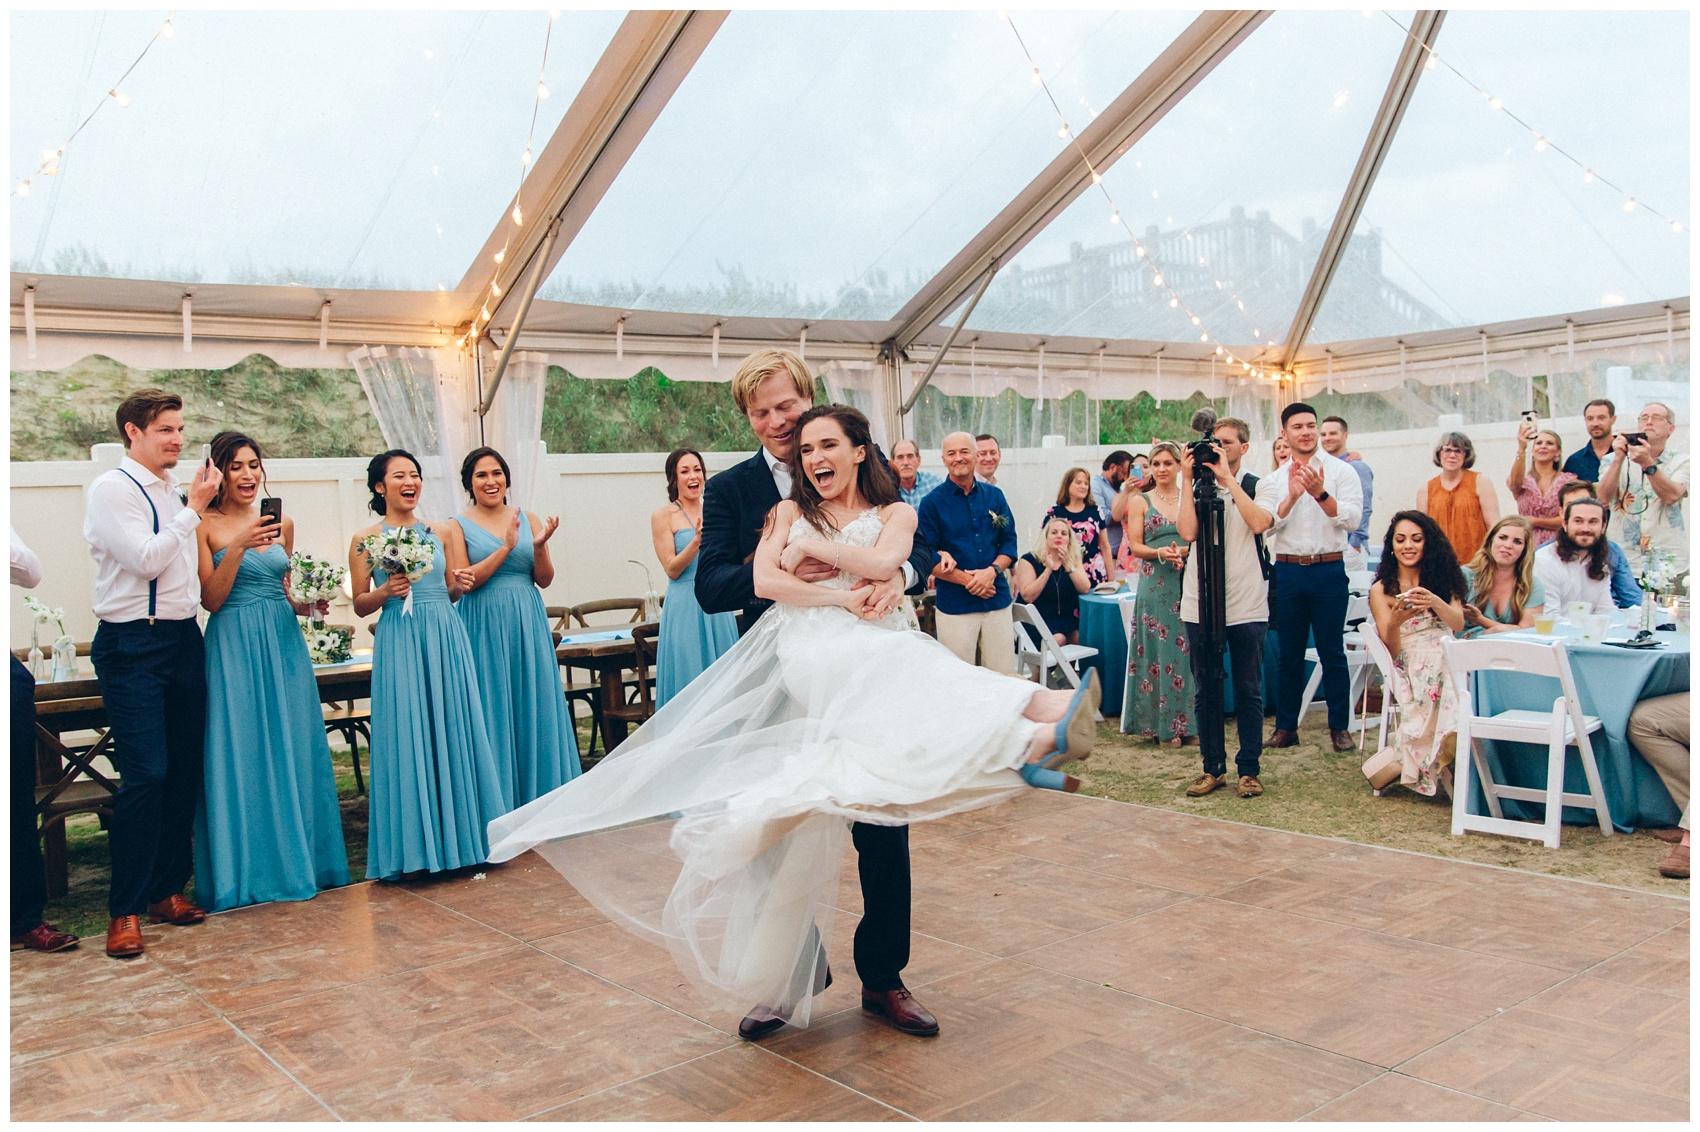 Outer-Banks-Corolla-Wedding_0105.jpg